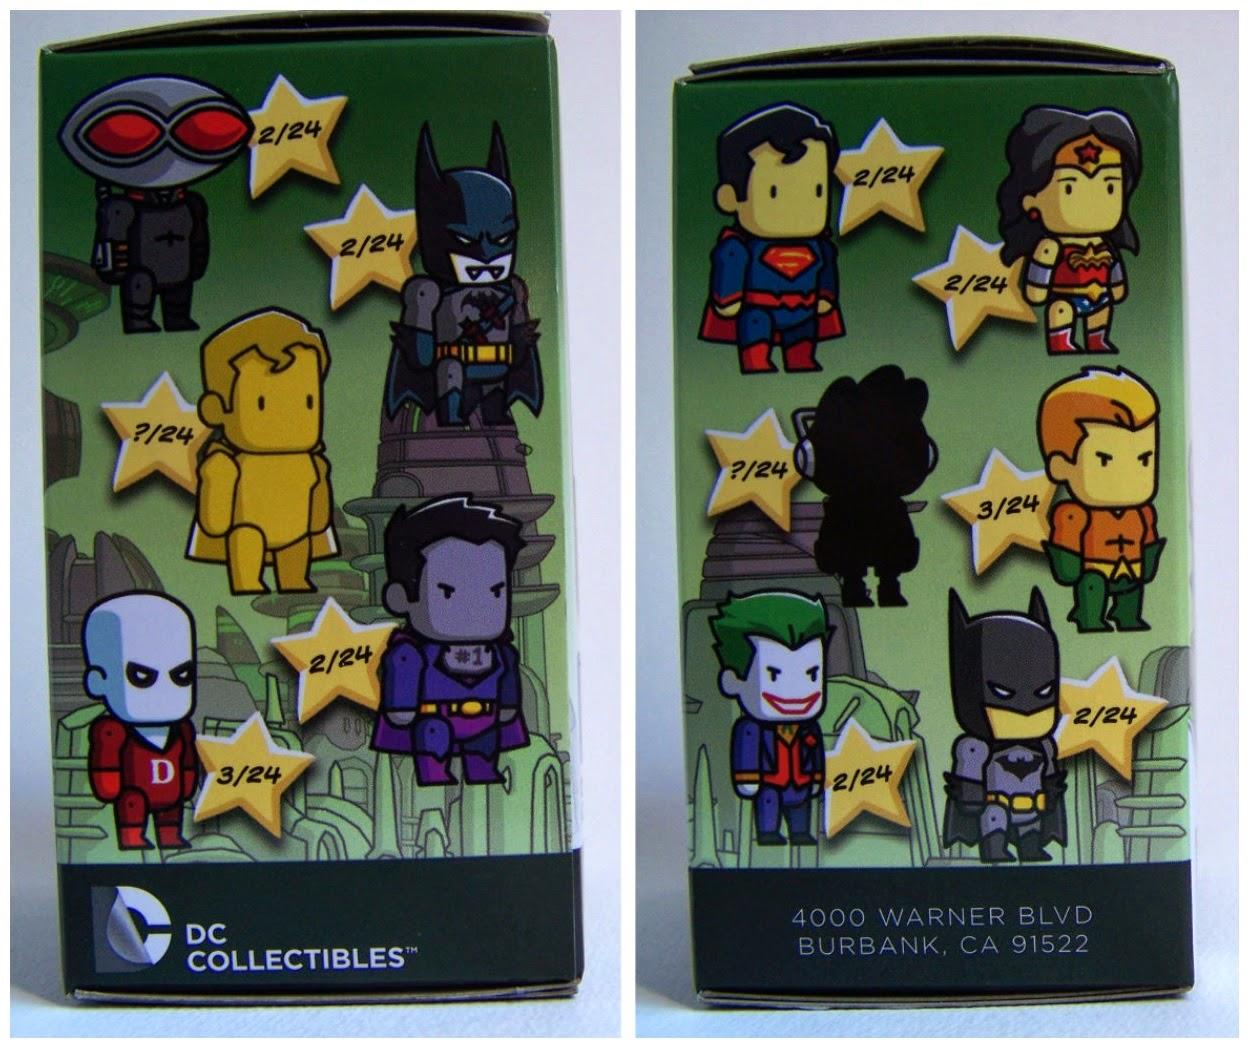 Scribblenauts DC series 1